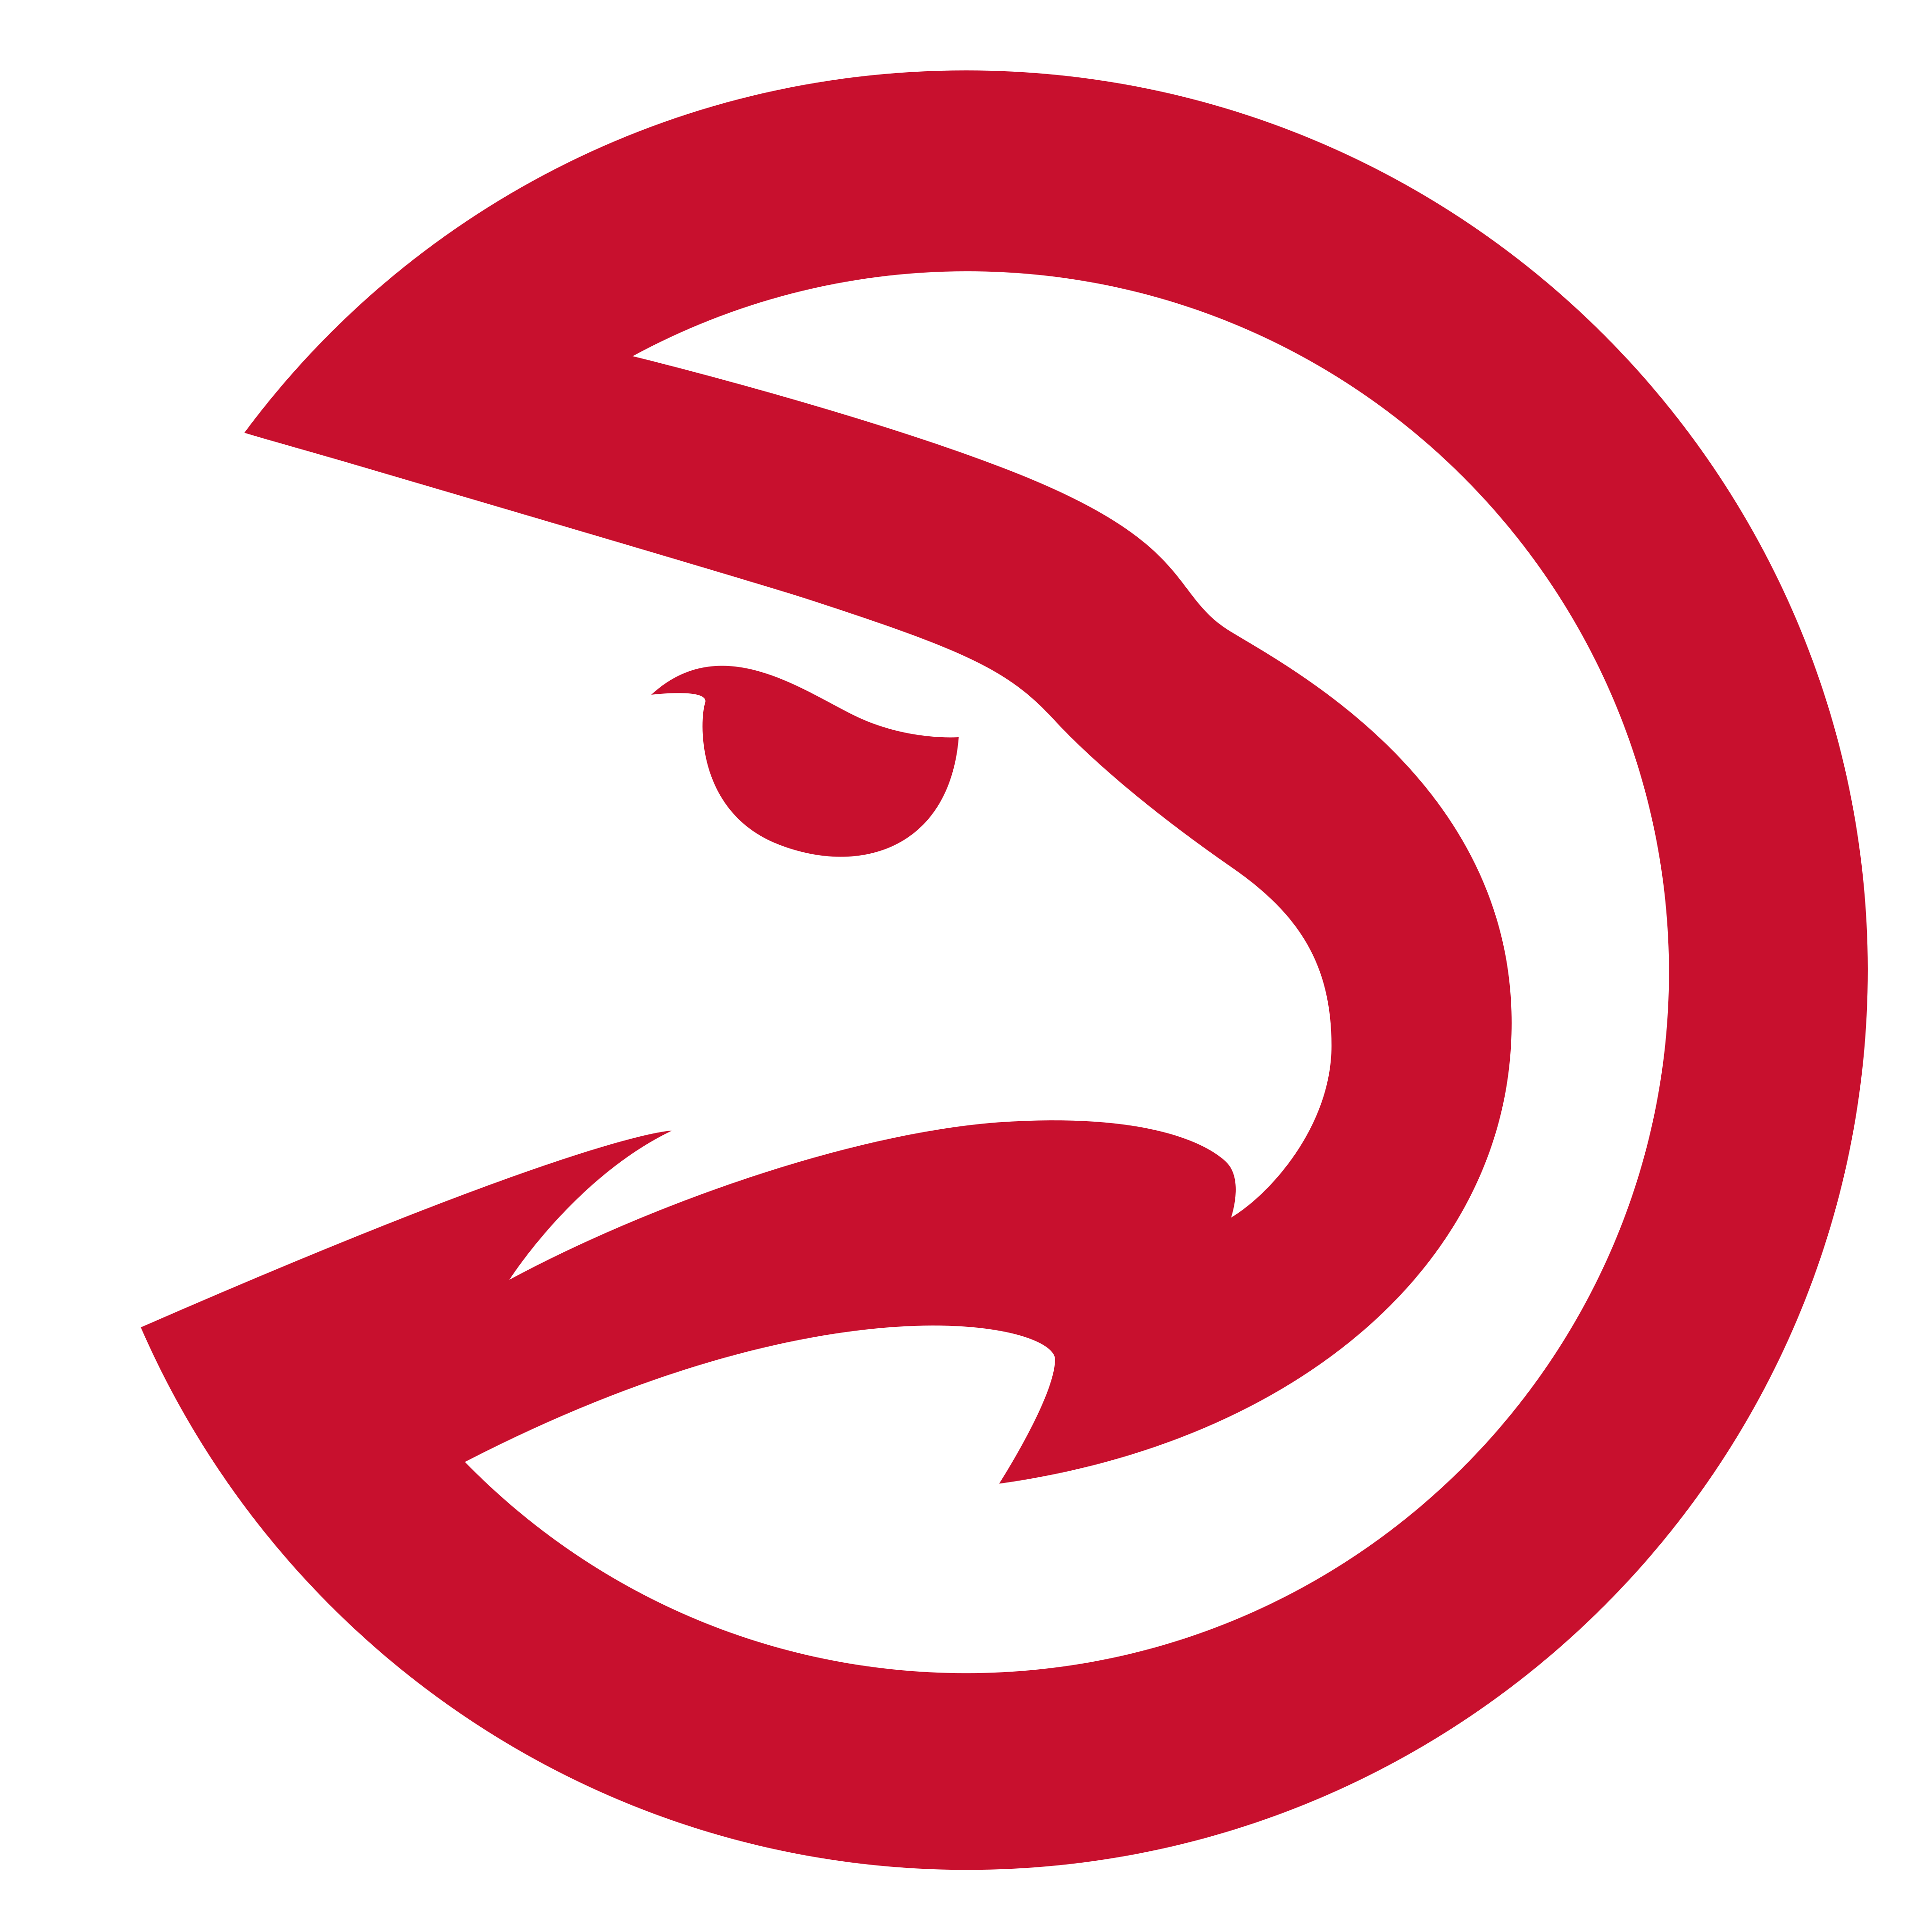 atlanta hawks logo - Atlanta Hawks Logo